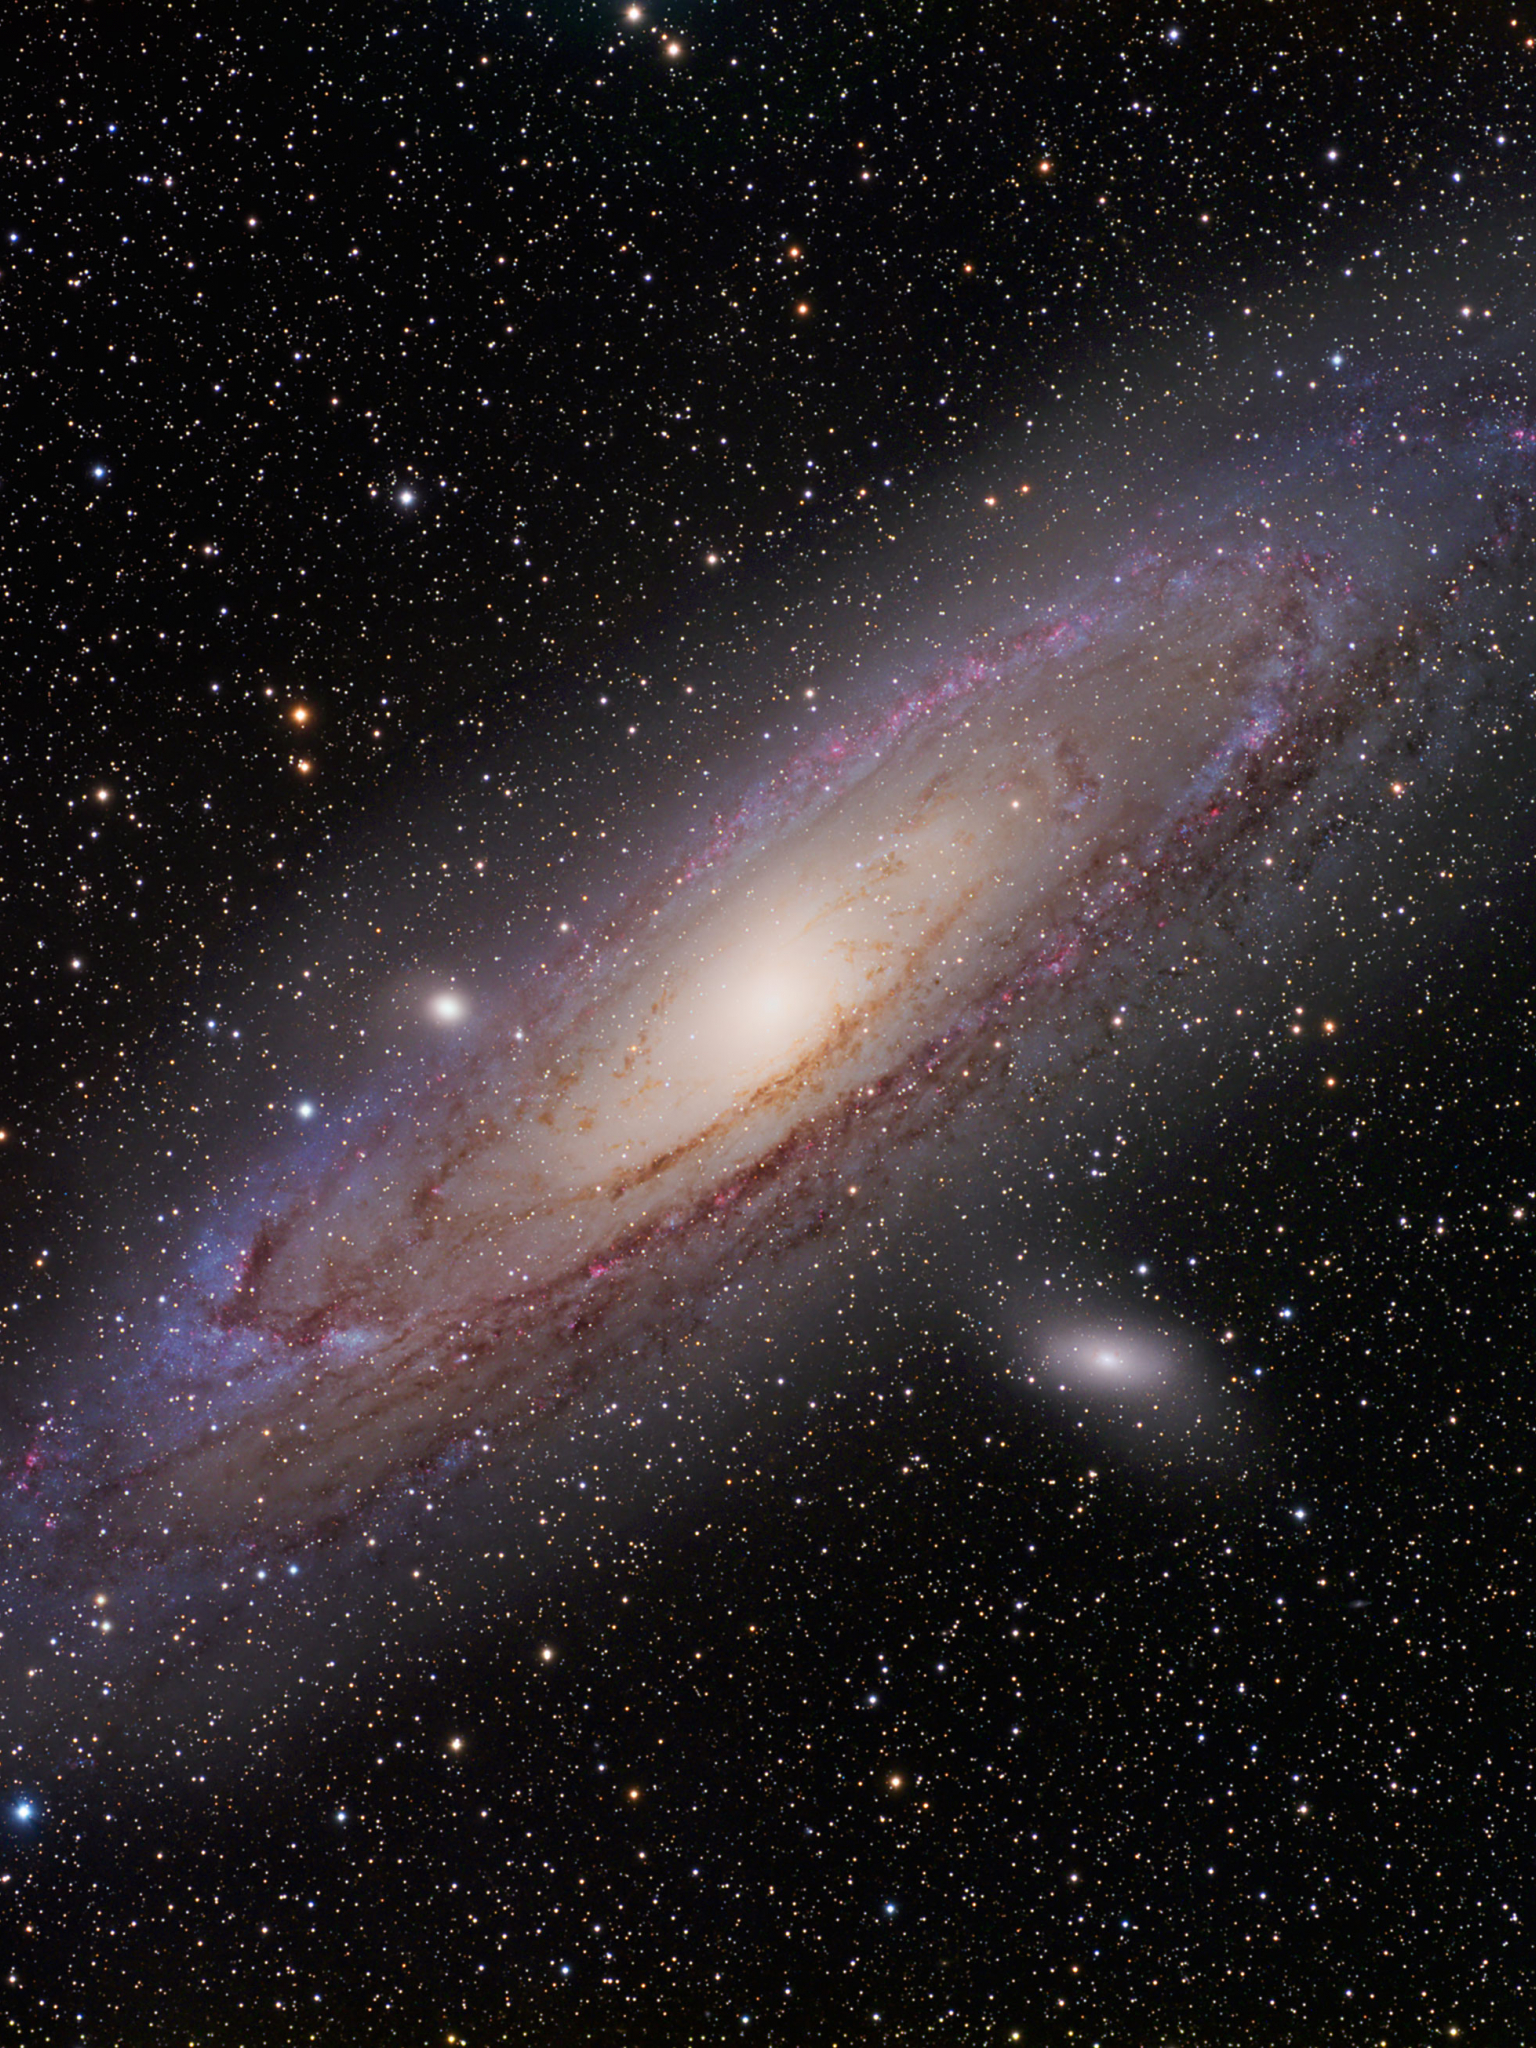 Free Download Hubble Ultra Deep Field Widescreen 13 1080p Wallpaperizcom 3960x2611 For Your Desktop Mobile Tablet Explore 49 Hubble Wallpaper 1080p Hd Nasa Wallpapers Best Space Wallpapers Hd Astronomy Wallpapers Hd